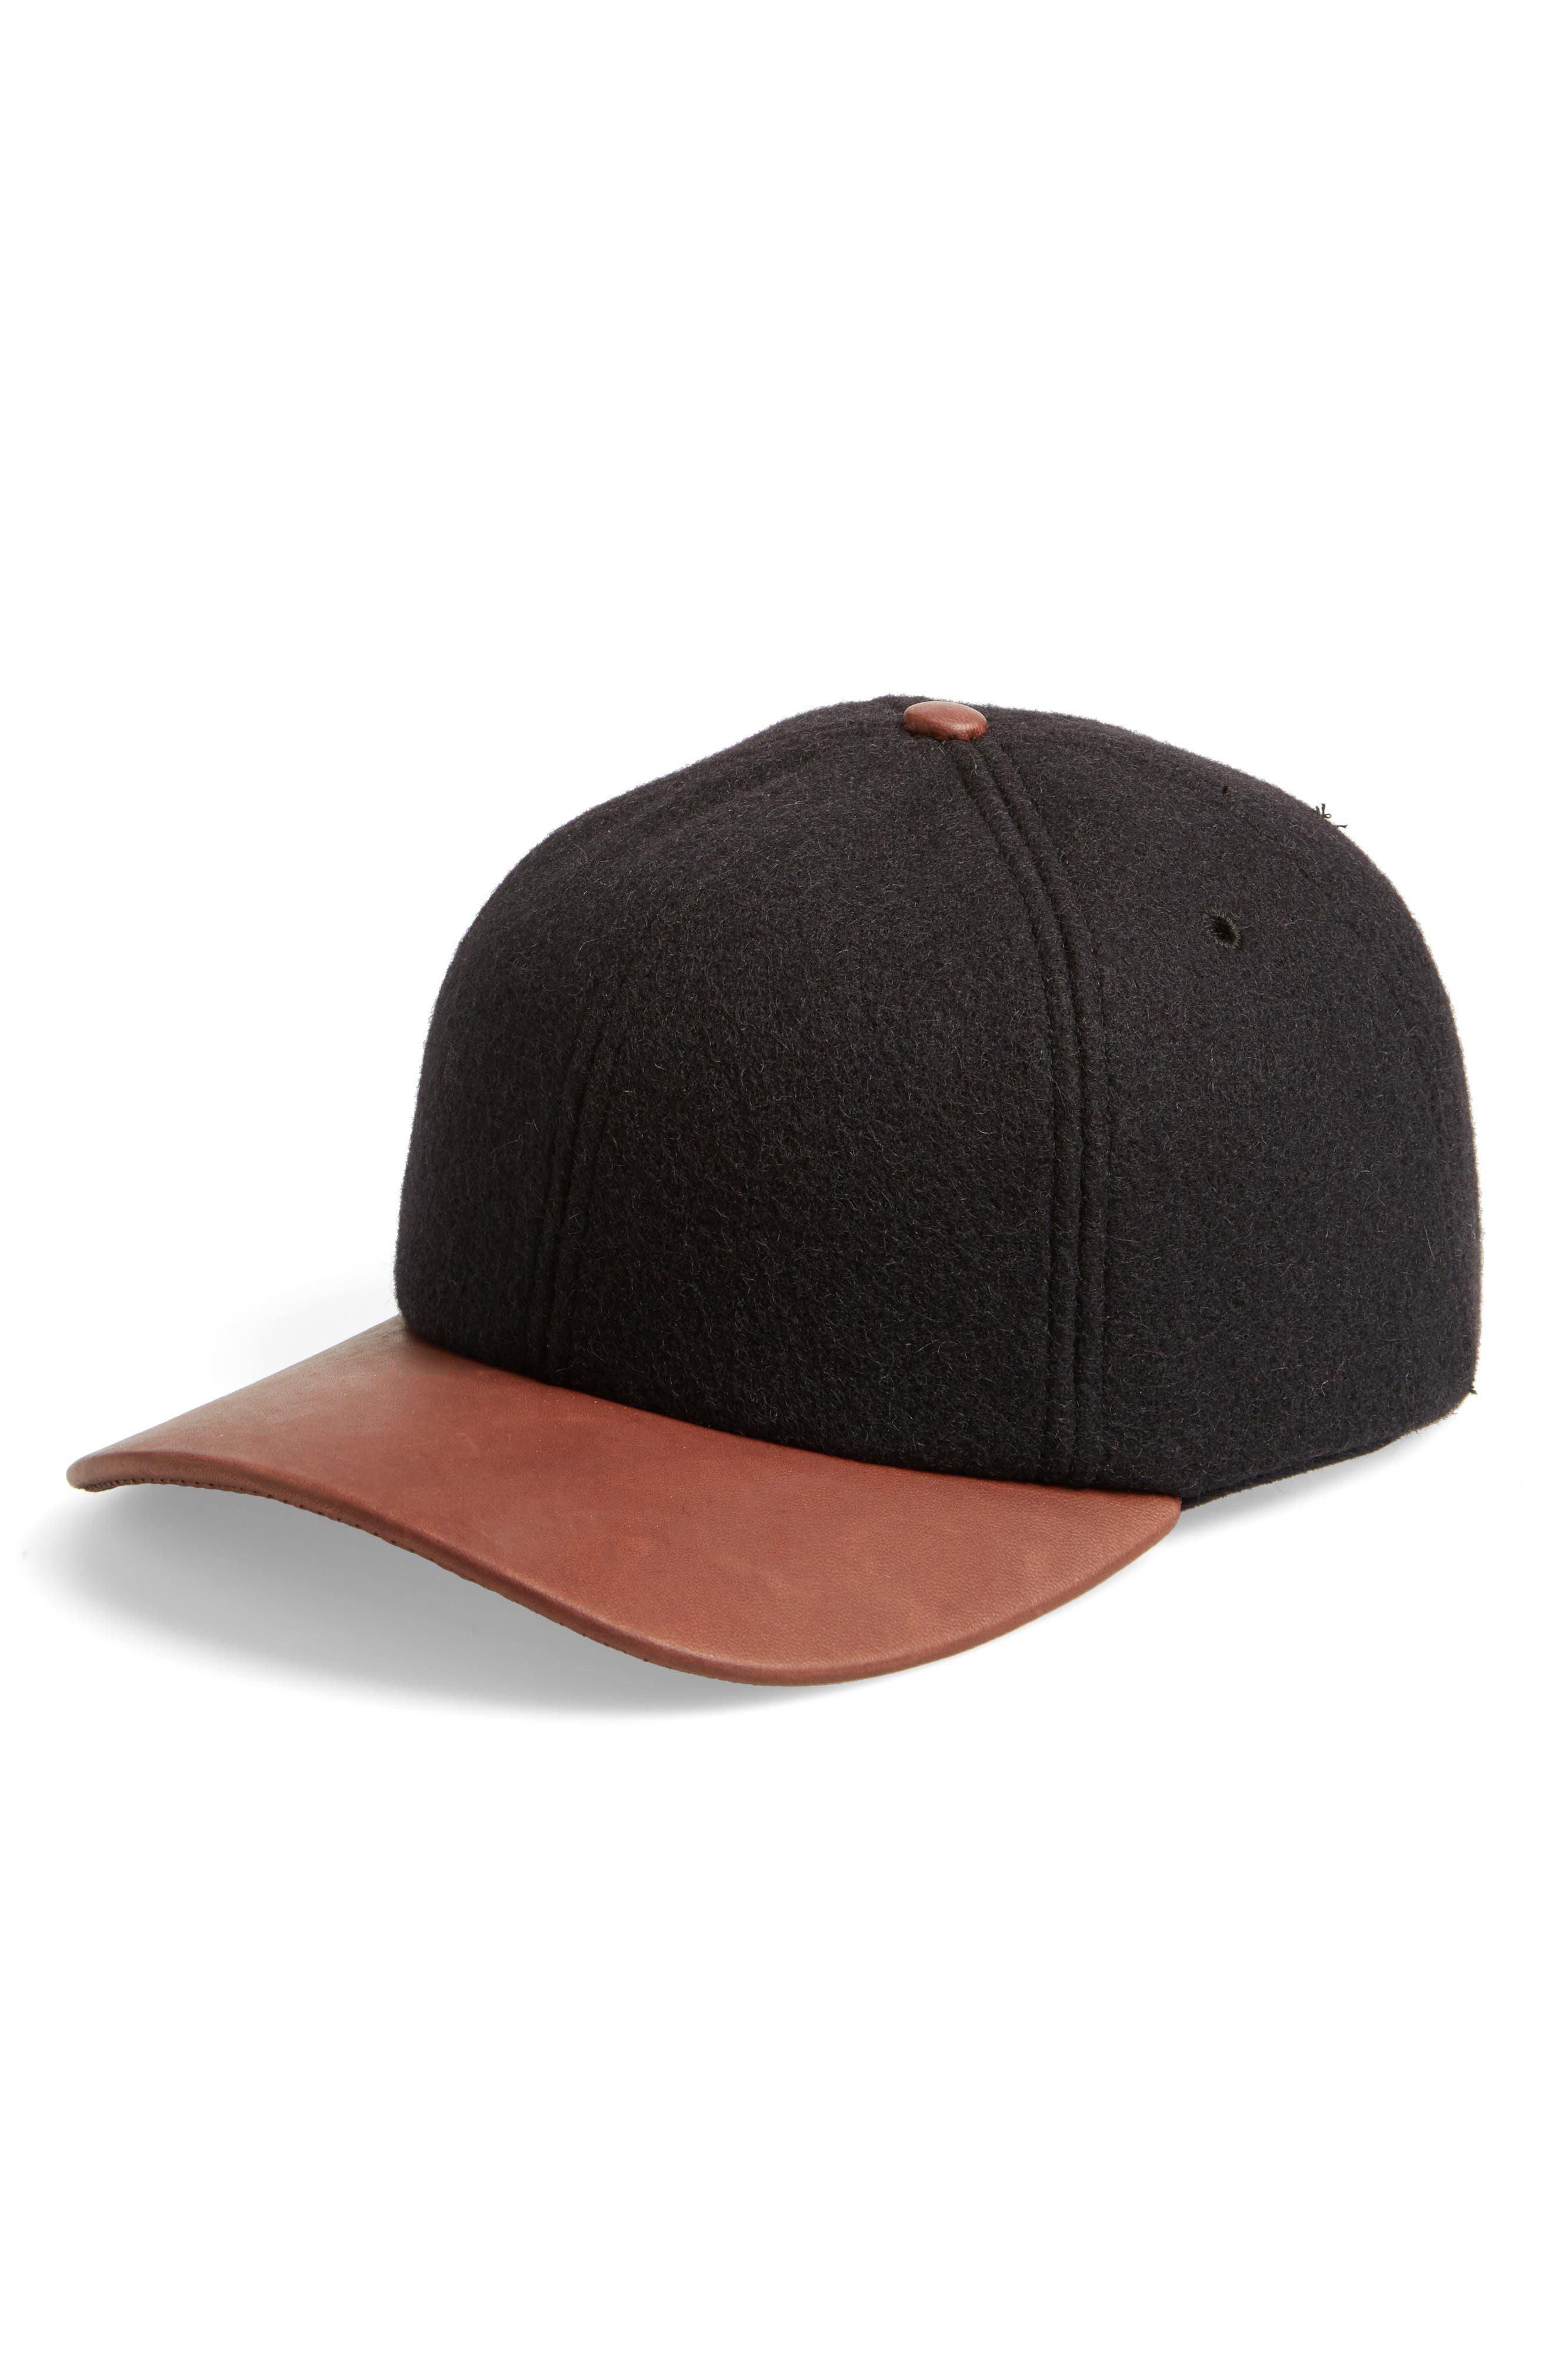 Melton Wool Blend Baseball Cap,                             Main thumbnail 1, color,                             001